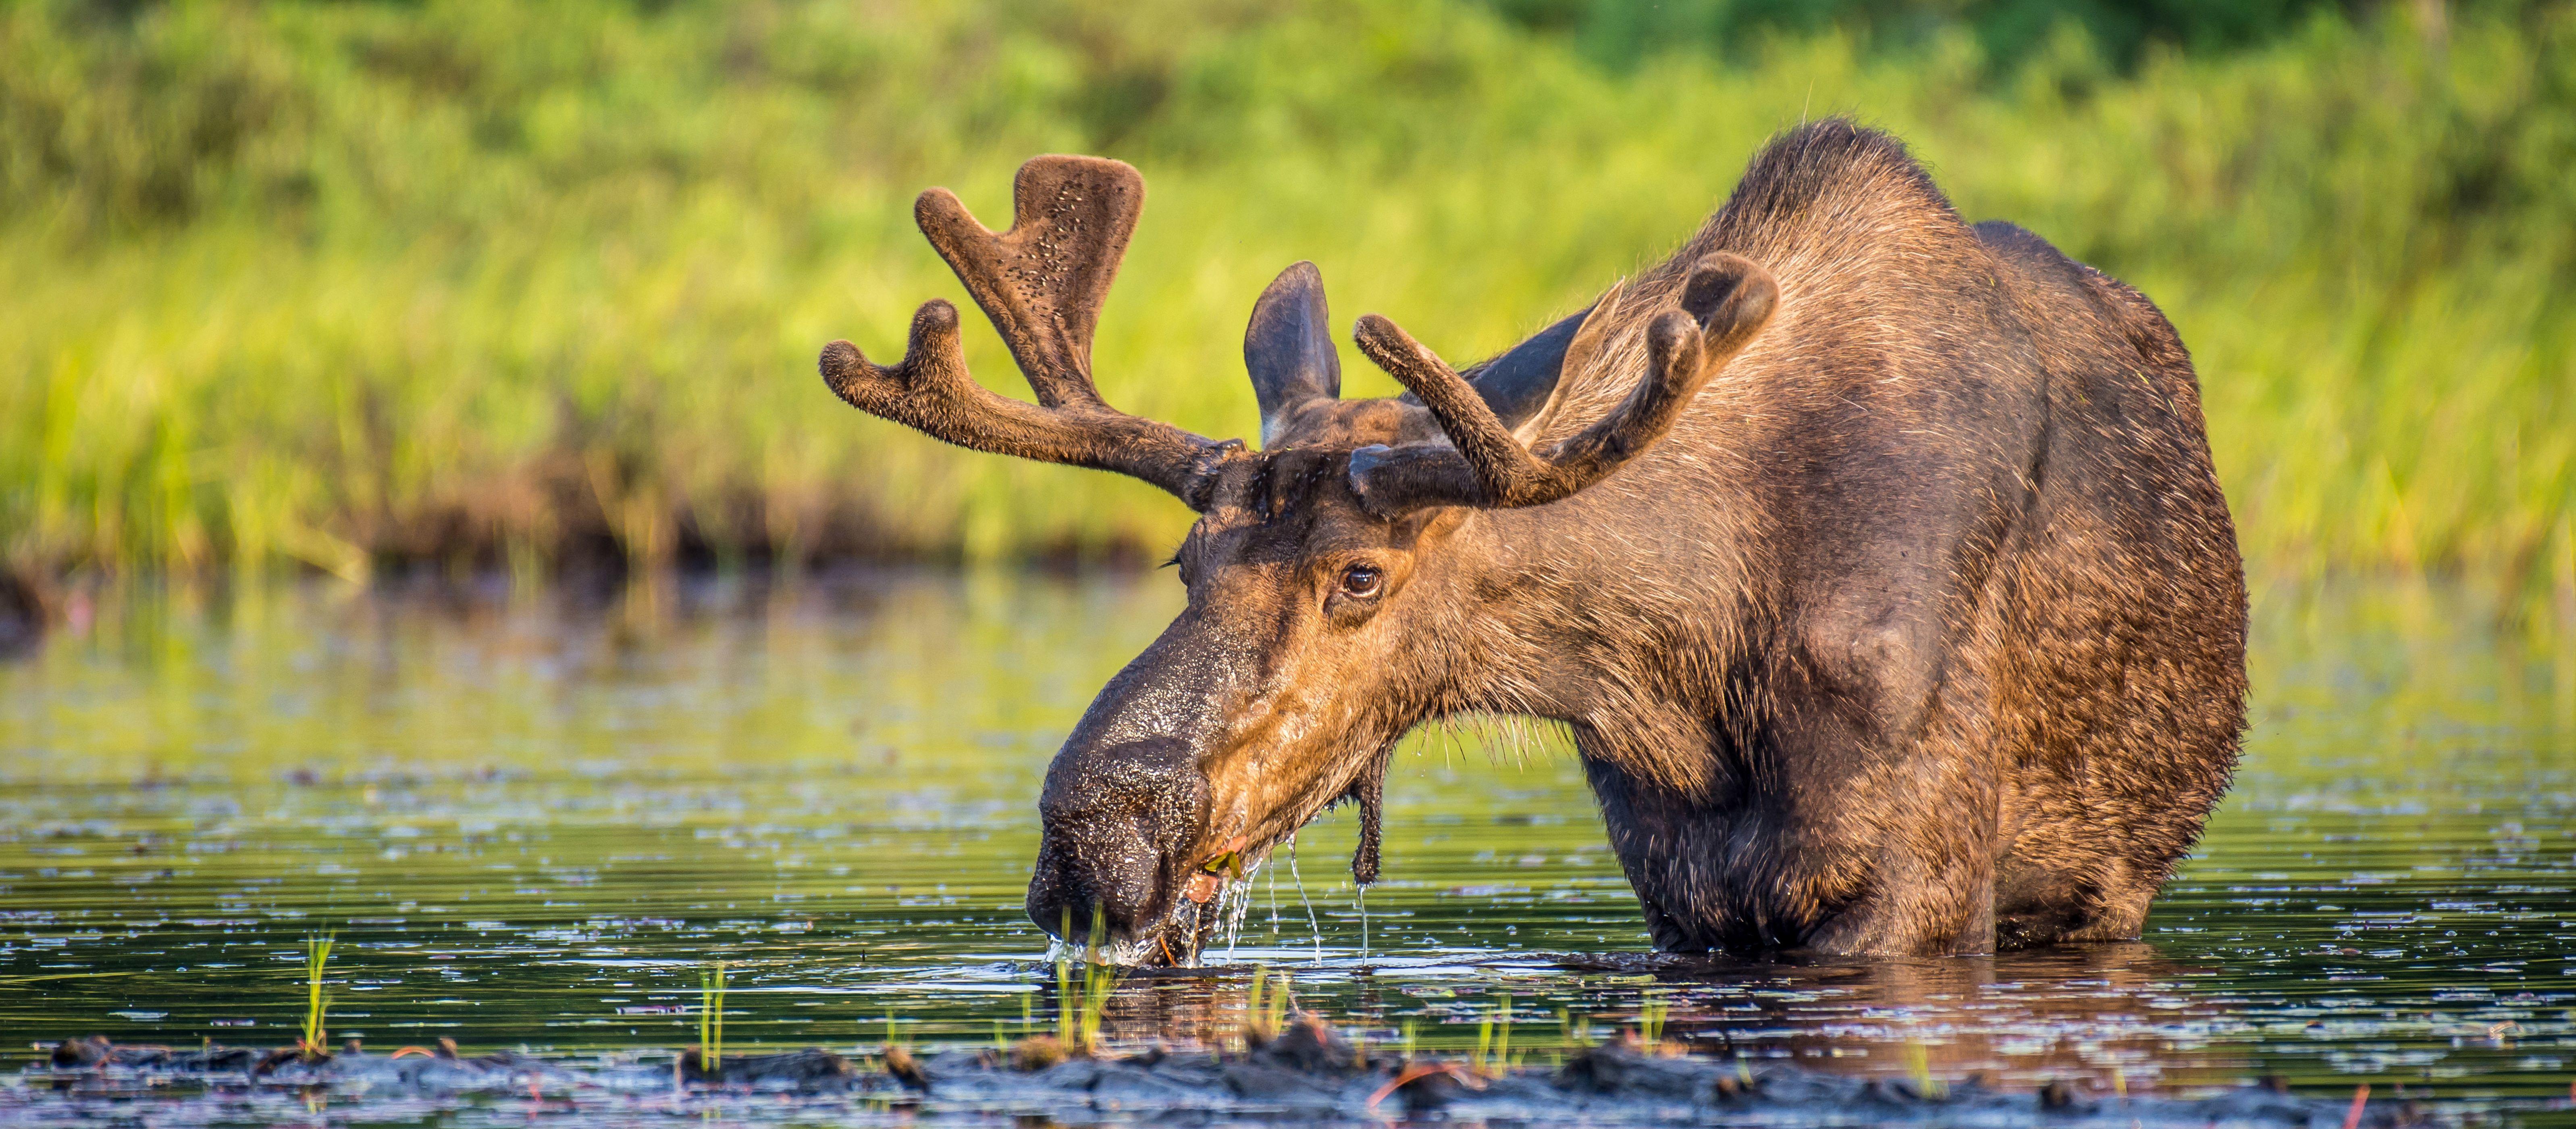 Elchbulle beim fressen im Lake Opeongo im Algonquin Provincial Park, Ontario